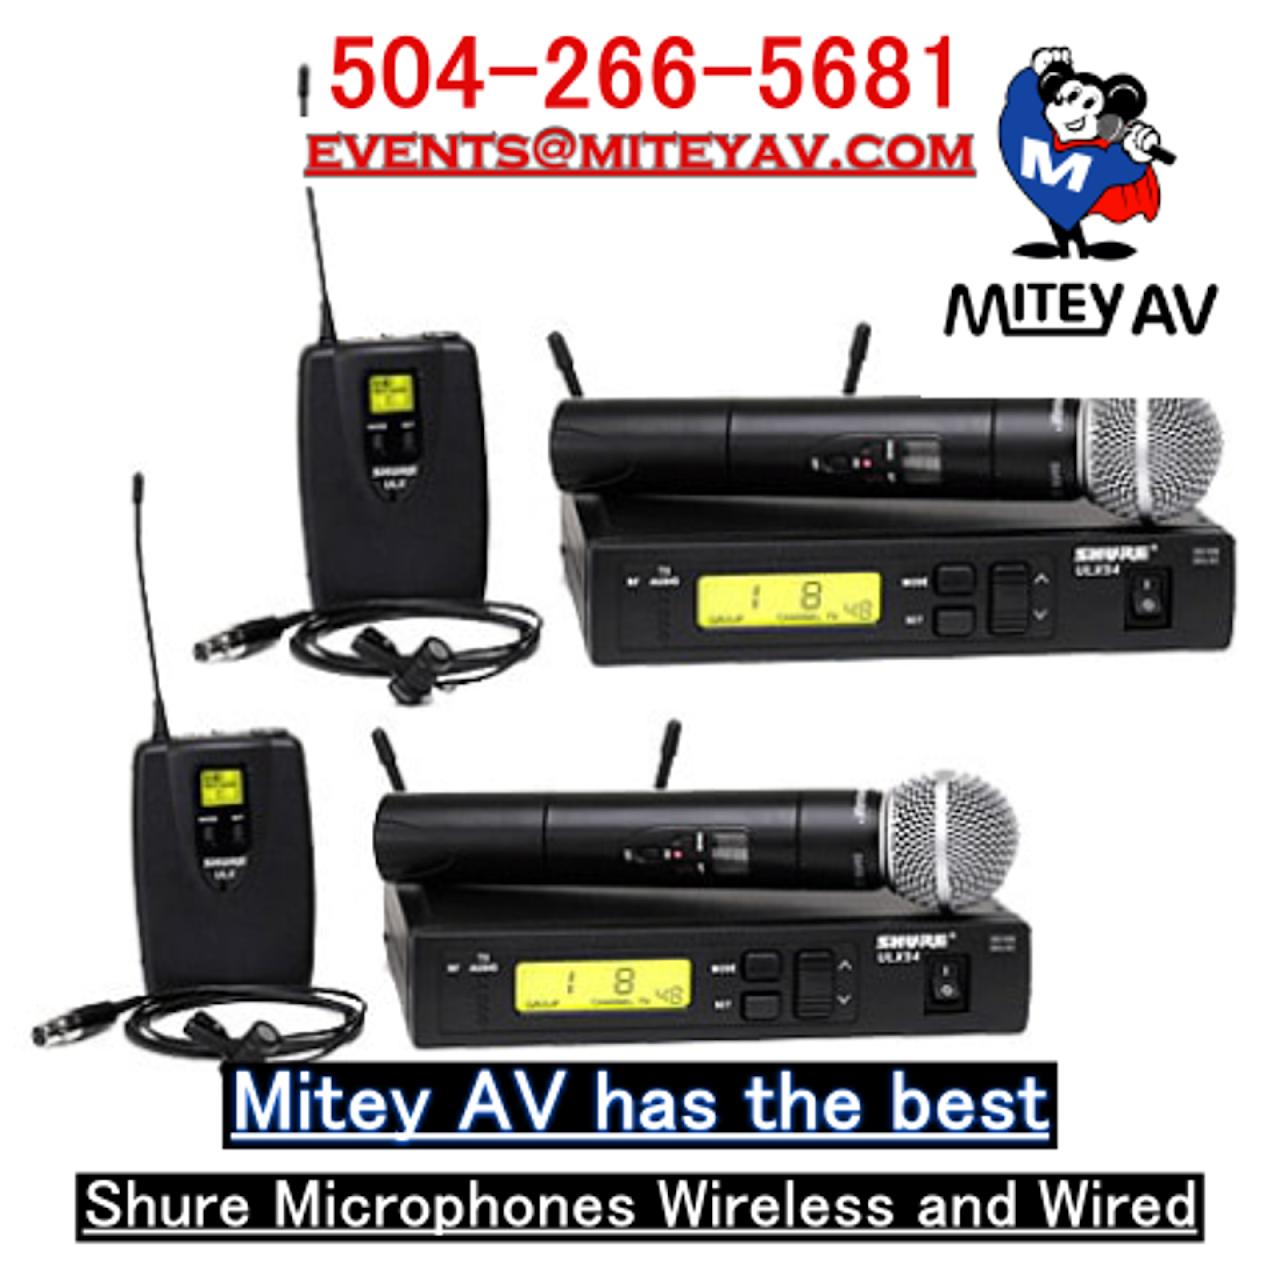 Audio Visual Equipment Rental New Orleans, LA